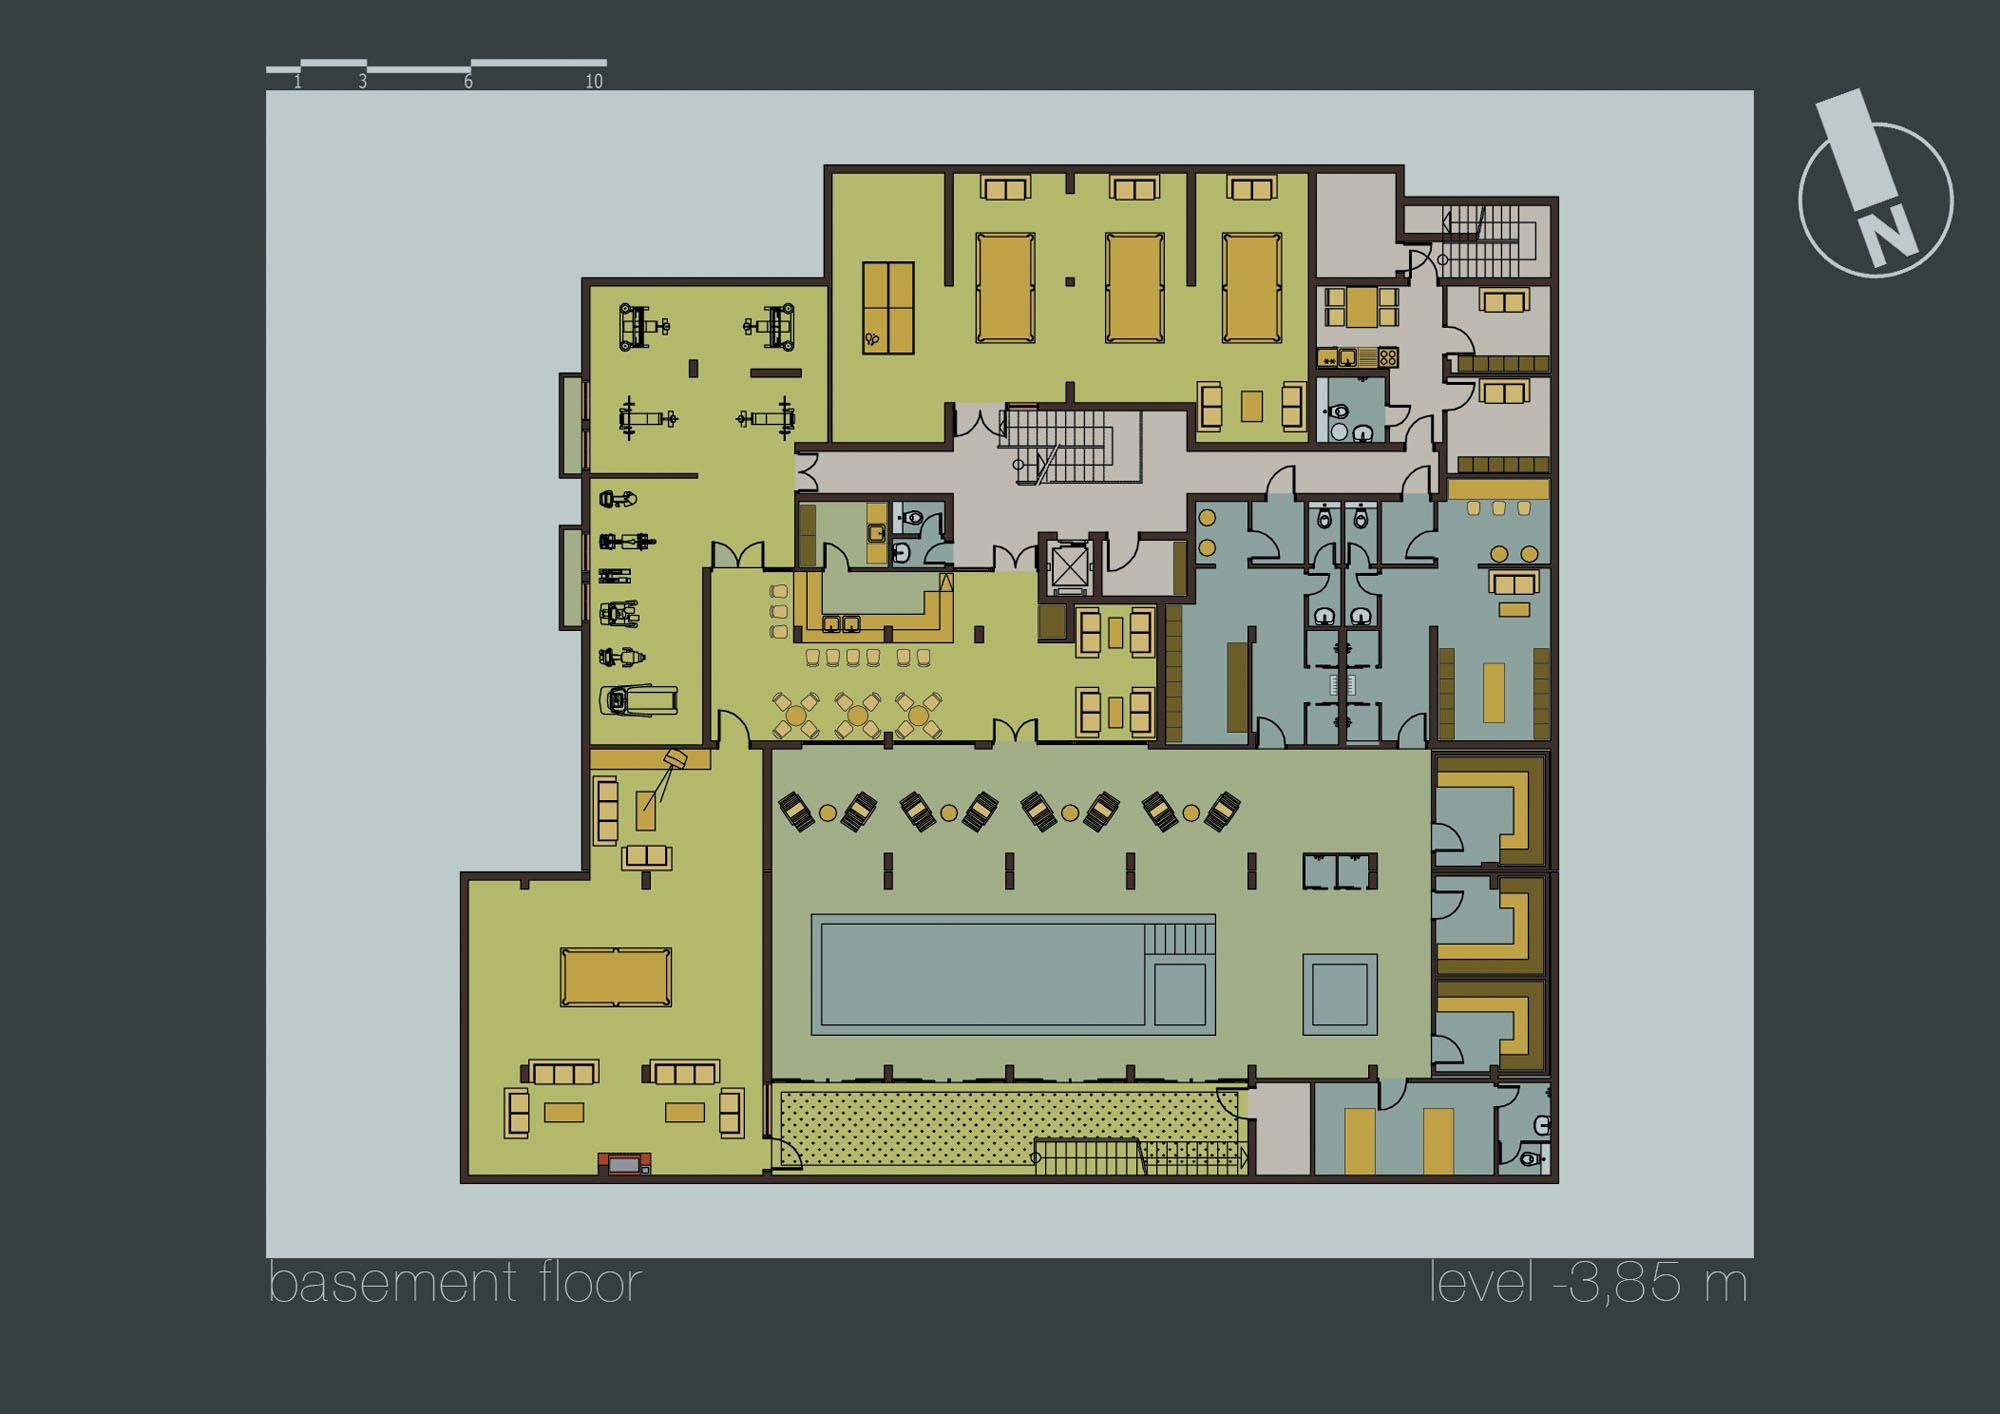 Shadowrun floorplan wohnkomplex keller maps pinterest shadowrun floorplan wohnkomplex keller malvernweather Choice Image